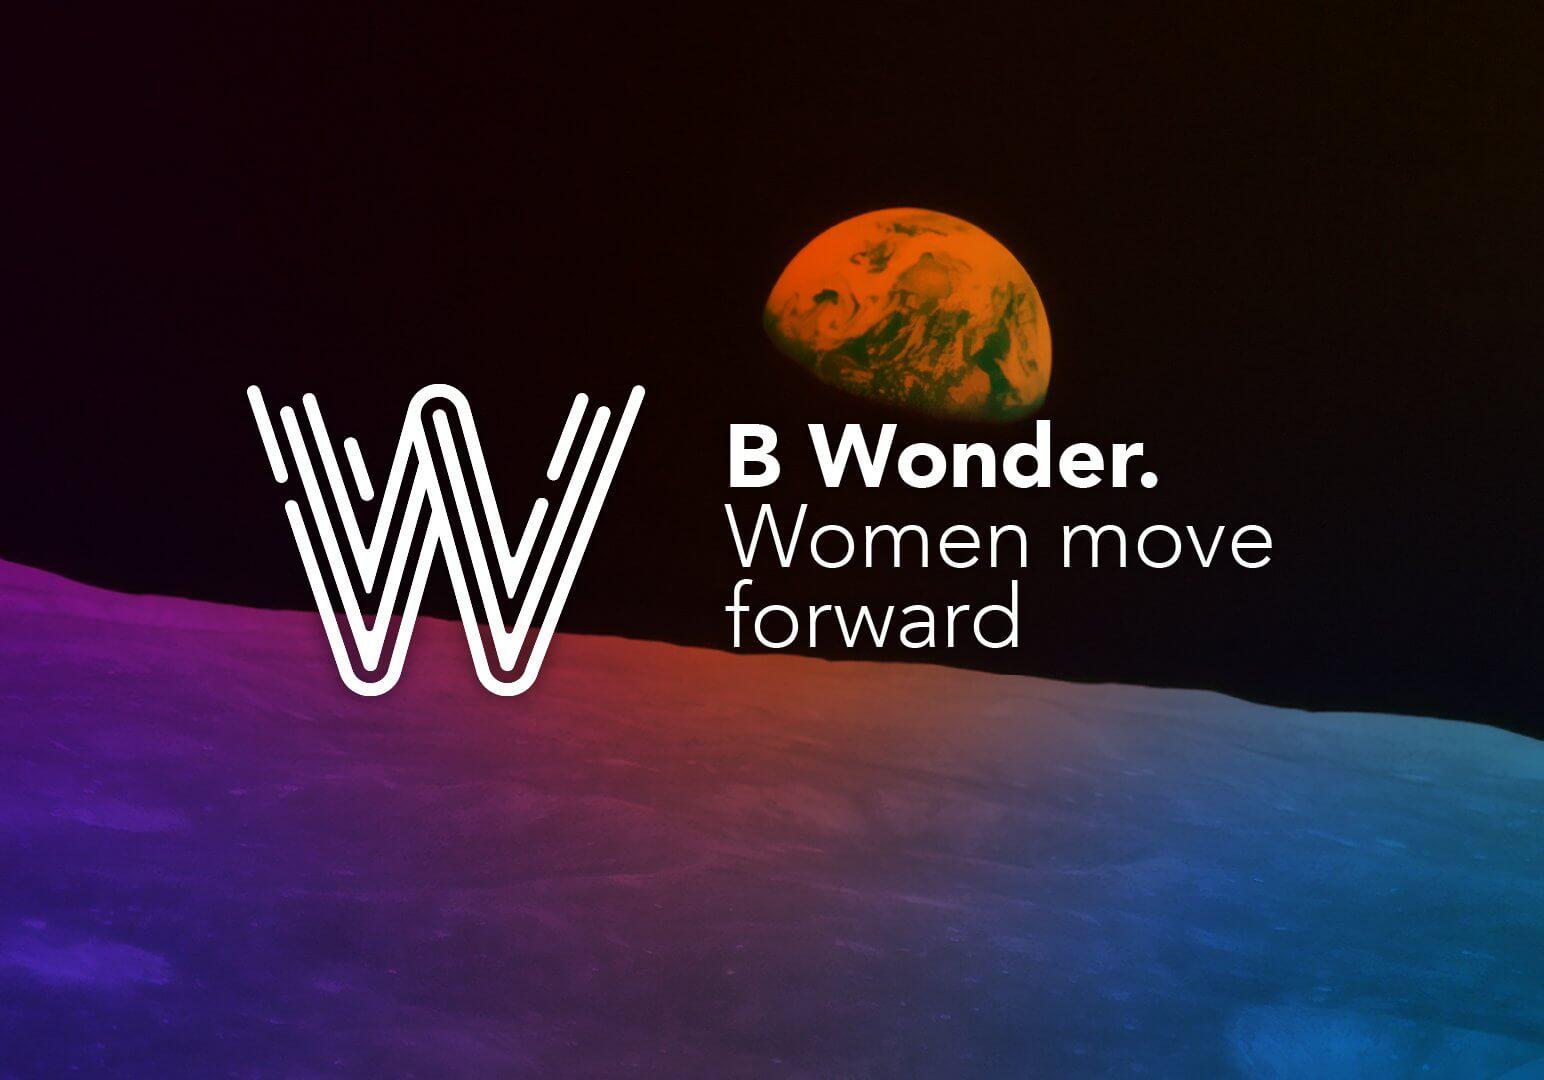 Immagine evidenza Campagna Spazio B Wonder 2021 Startup B Heroes